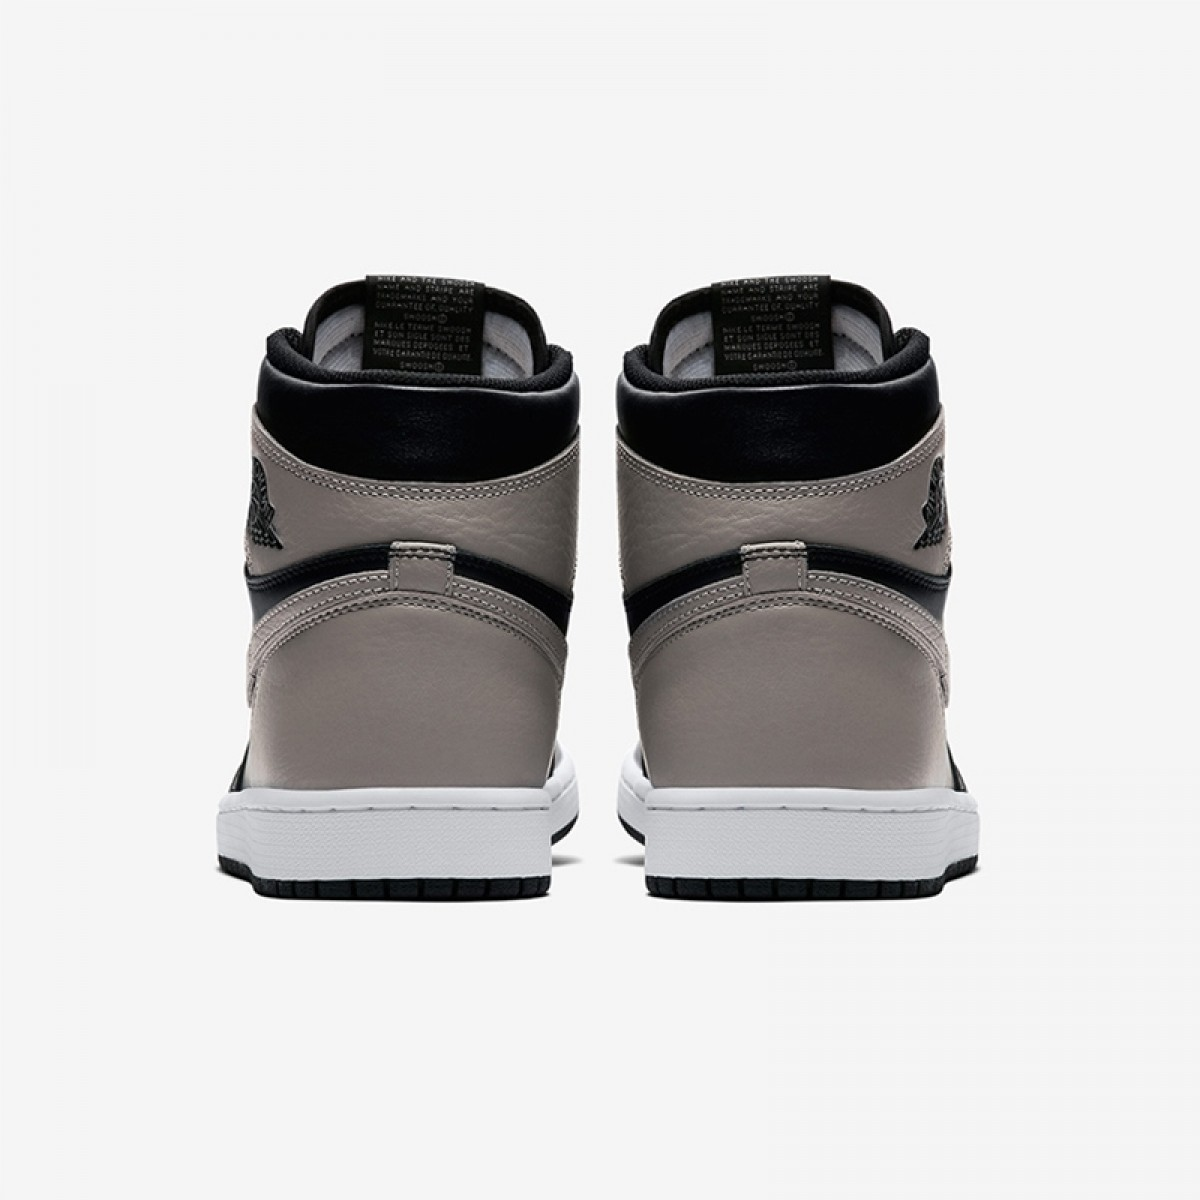 Air Jordan 1 Retro OG HI 'Shadow' 555088-013